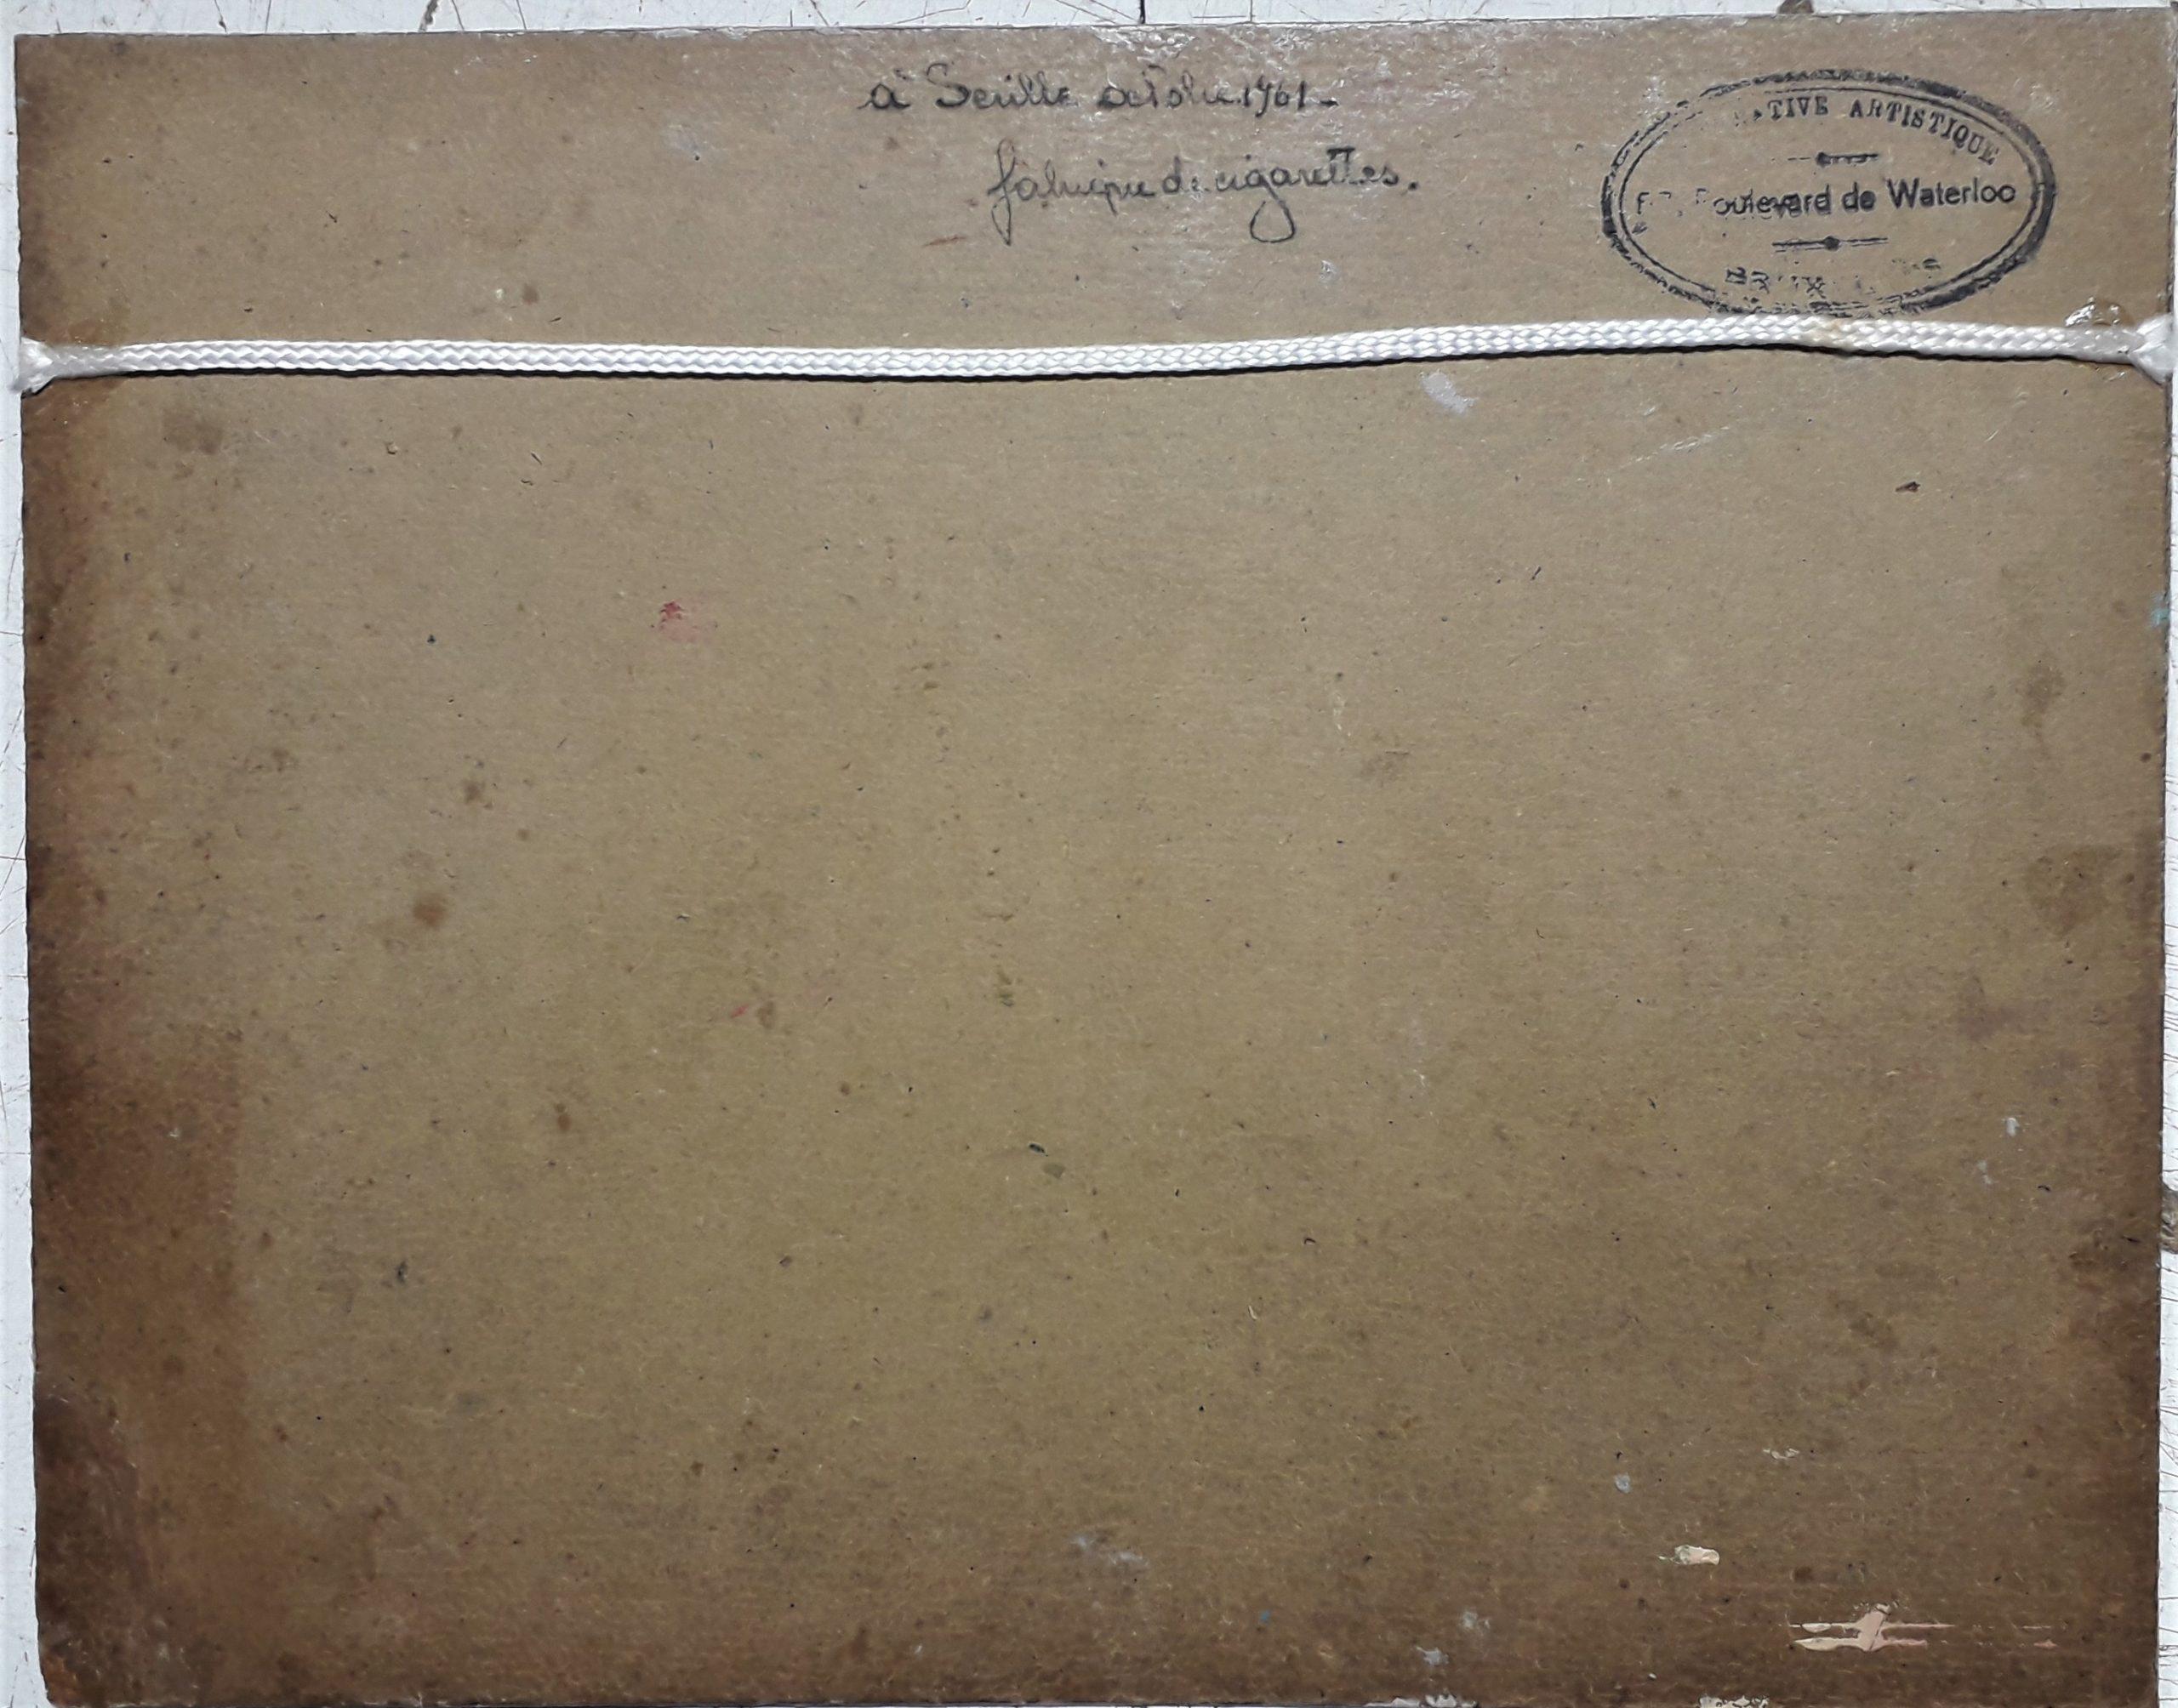 gerard-maud-seville-la-fabrique-de-cigarettes-1961-verso